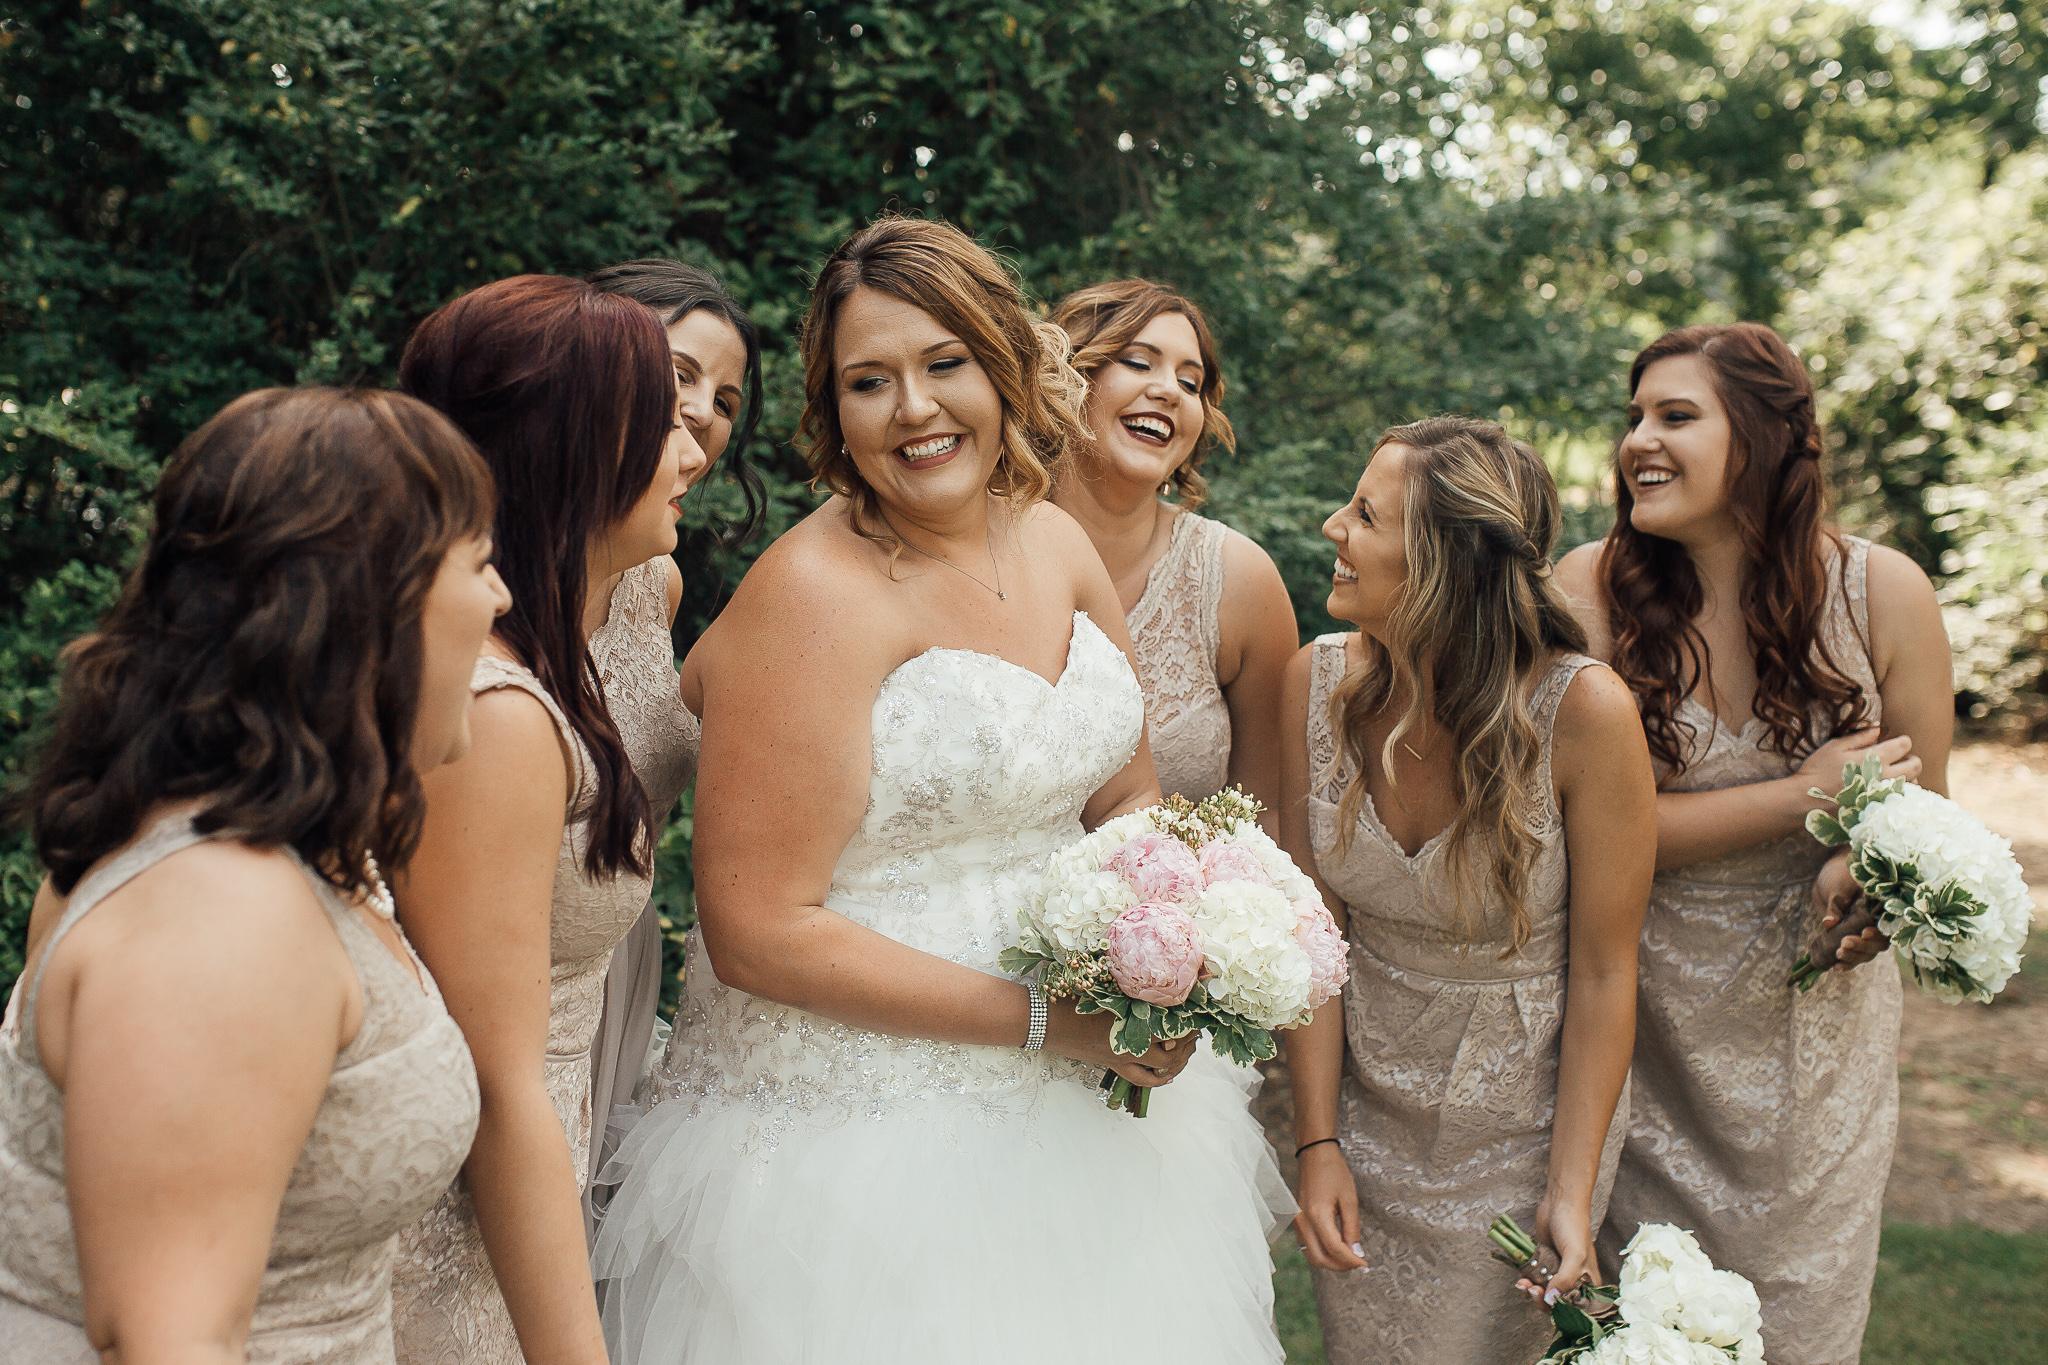 memphis-wedding-photographer-cassie-cook-photography-chattanooga-wedding-photographer